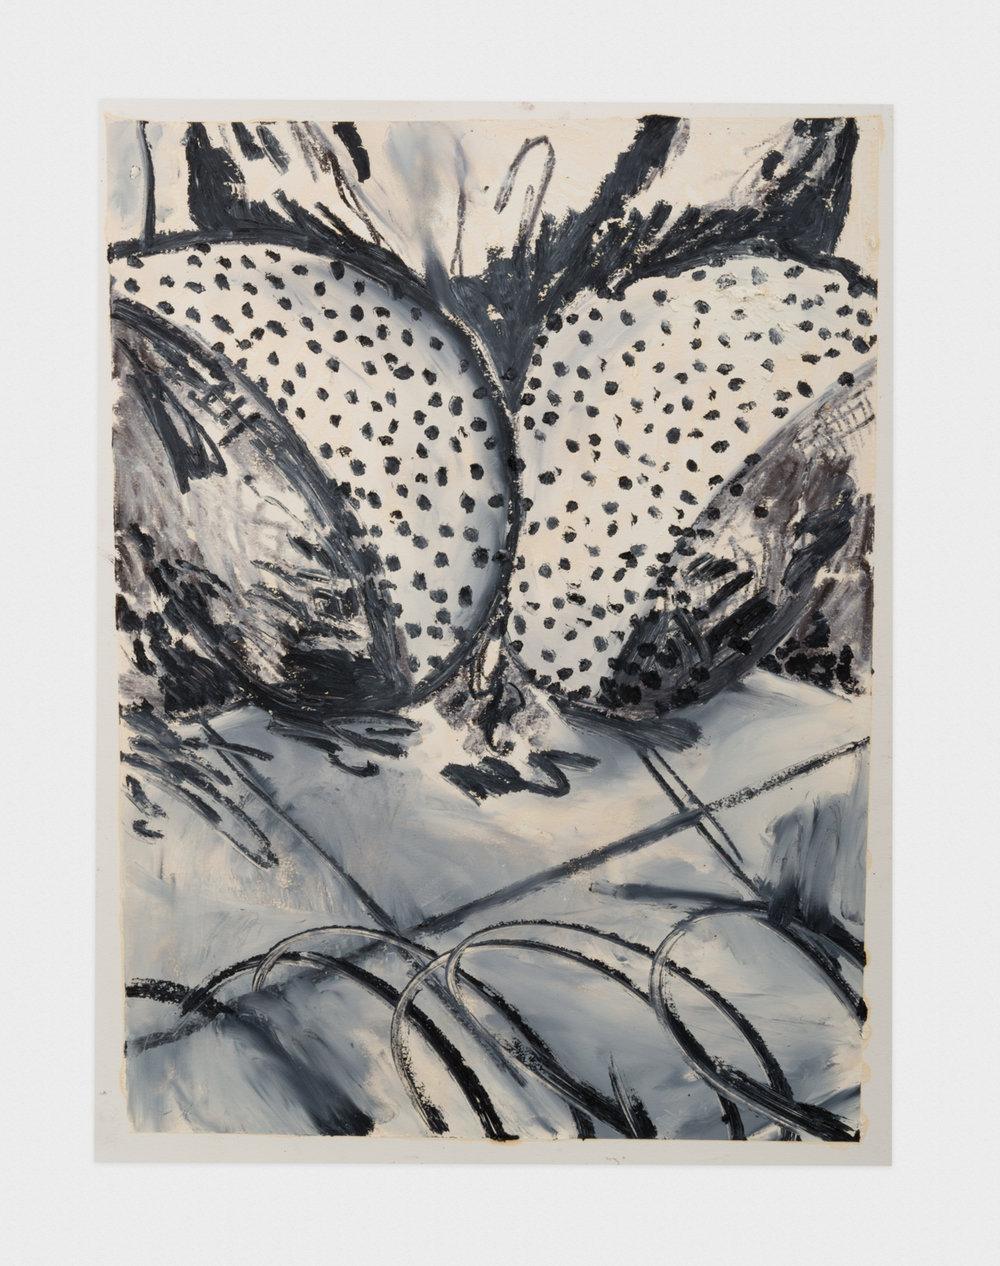 Alex Becerra Sun Tan Dots 2016 Oil pastel on paper 24 x 18in (60.96h x 45.72w cm) AB132